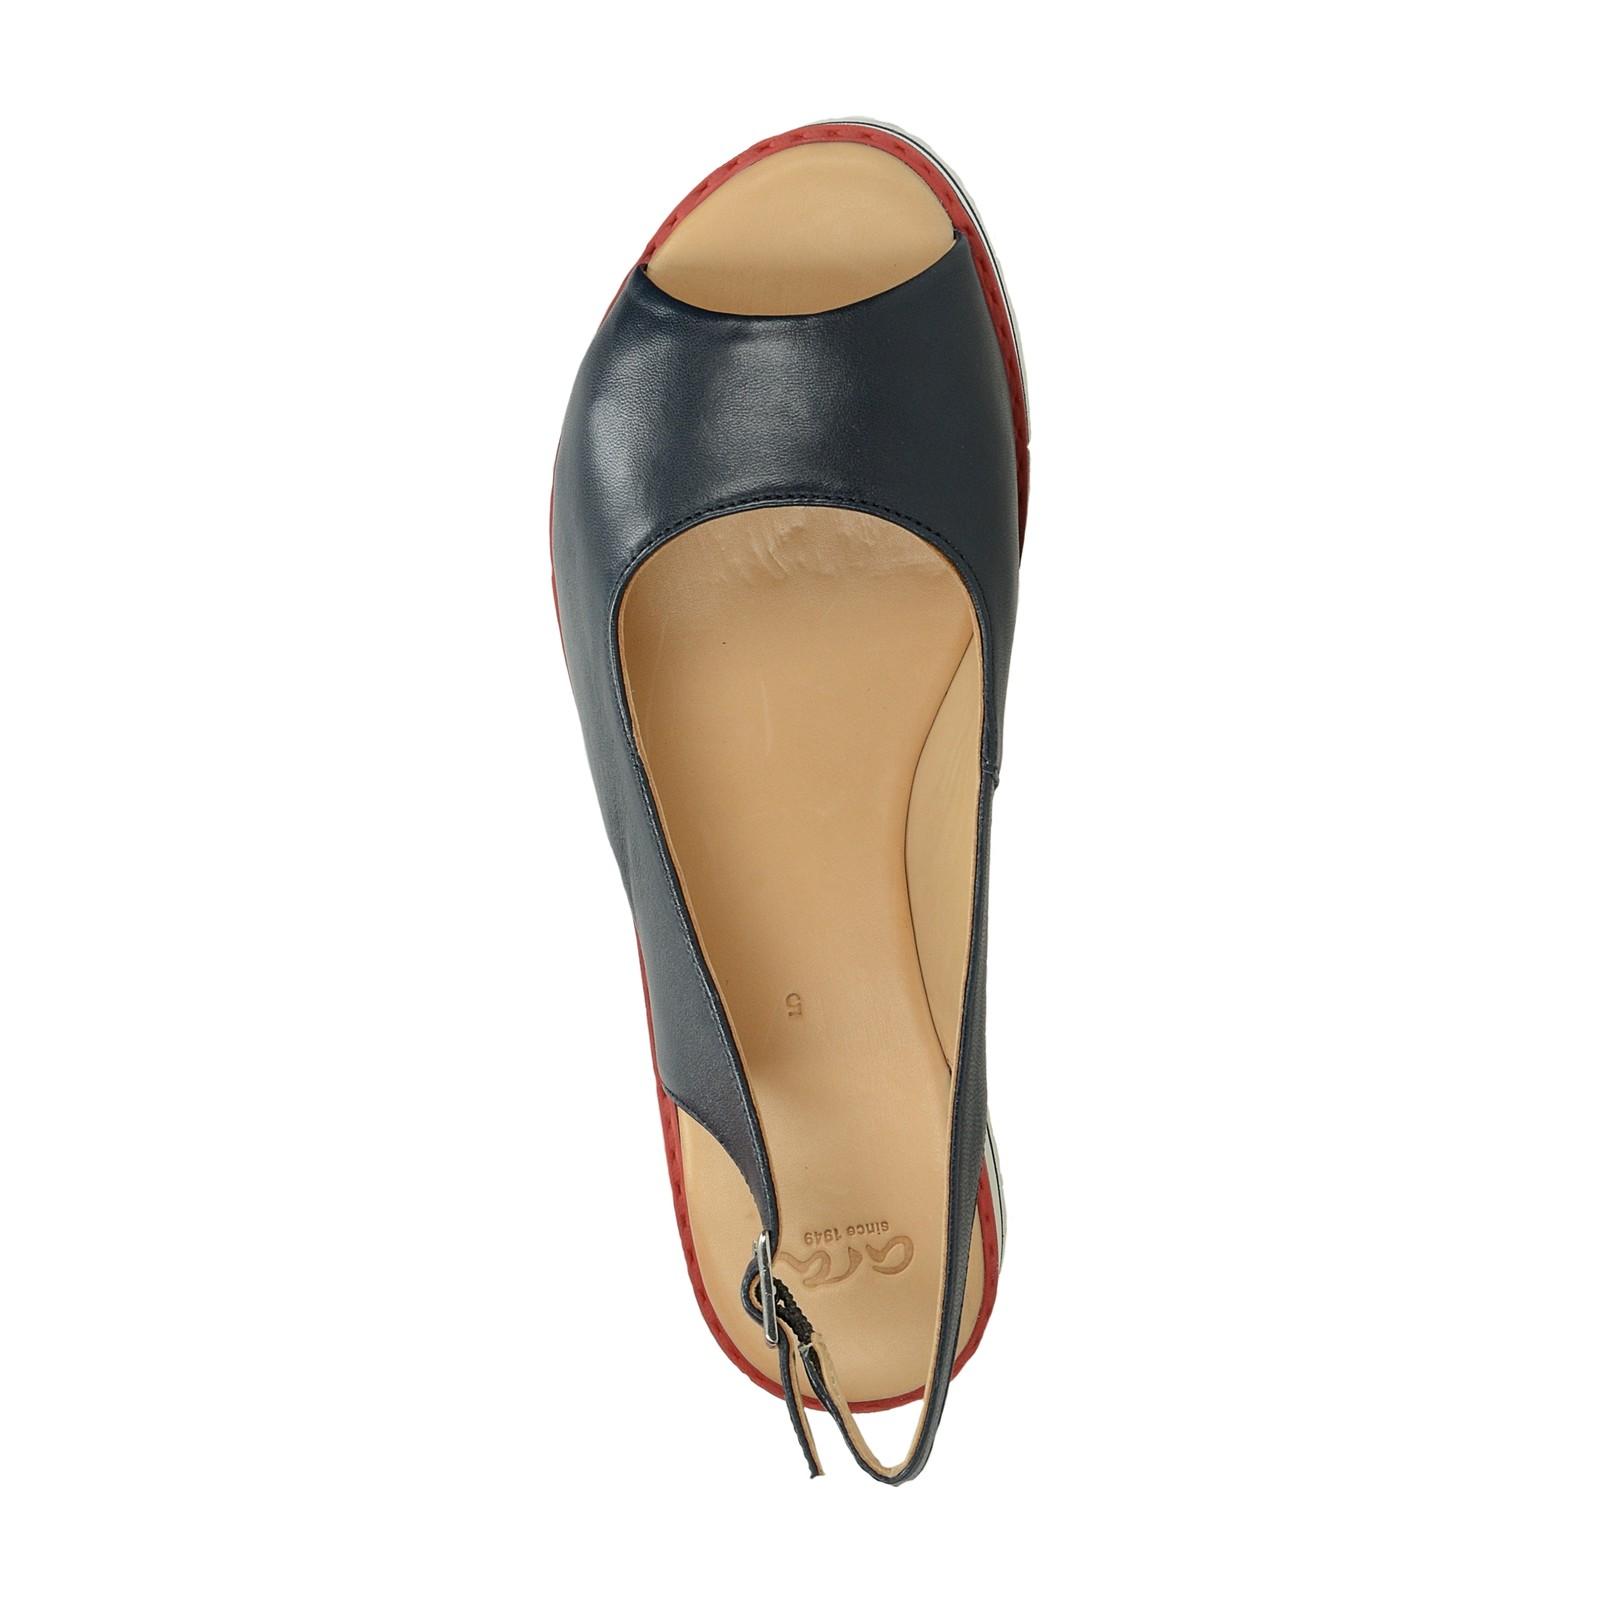 Ara dámské kožené sandály - tmavomodré